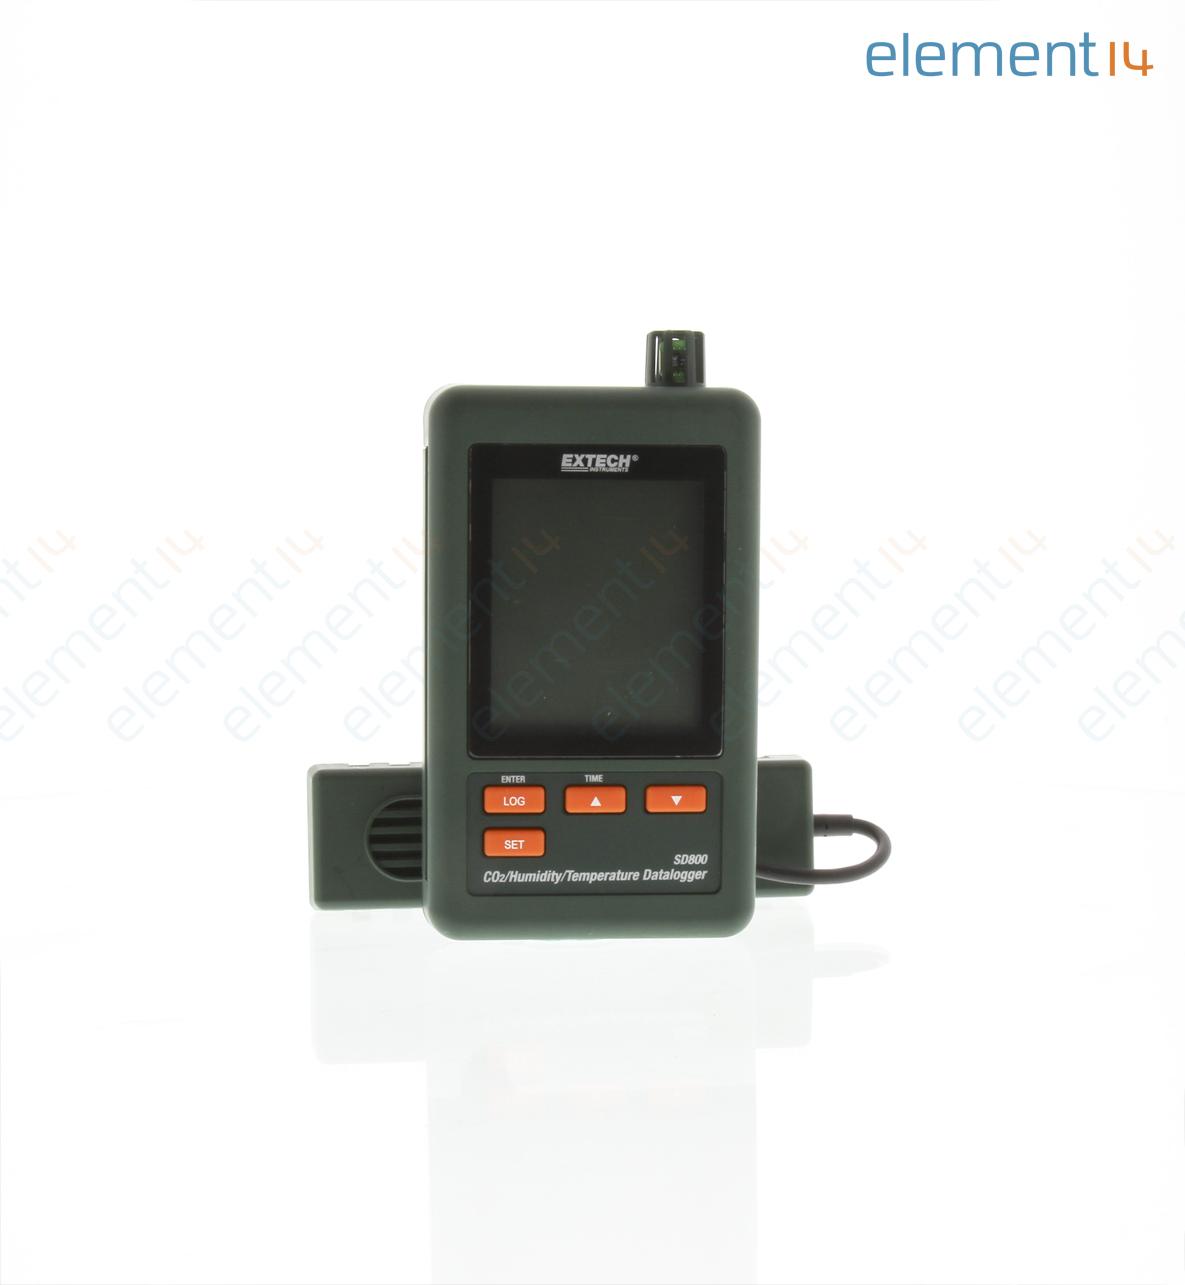 Sd800 extech instruments medidor de humedad 10 a 90 - Humedad relativa espana ...